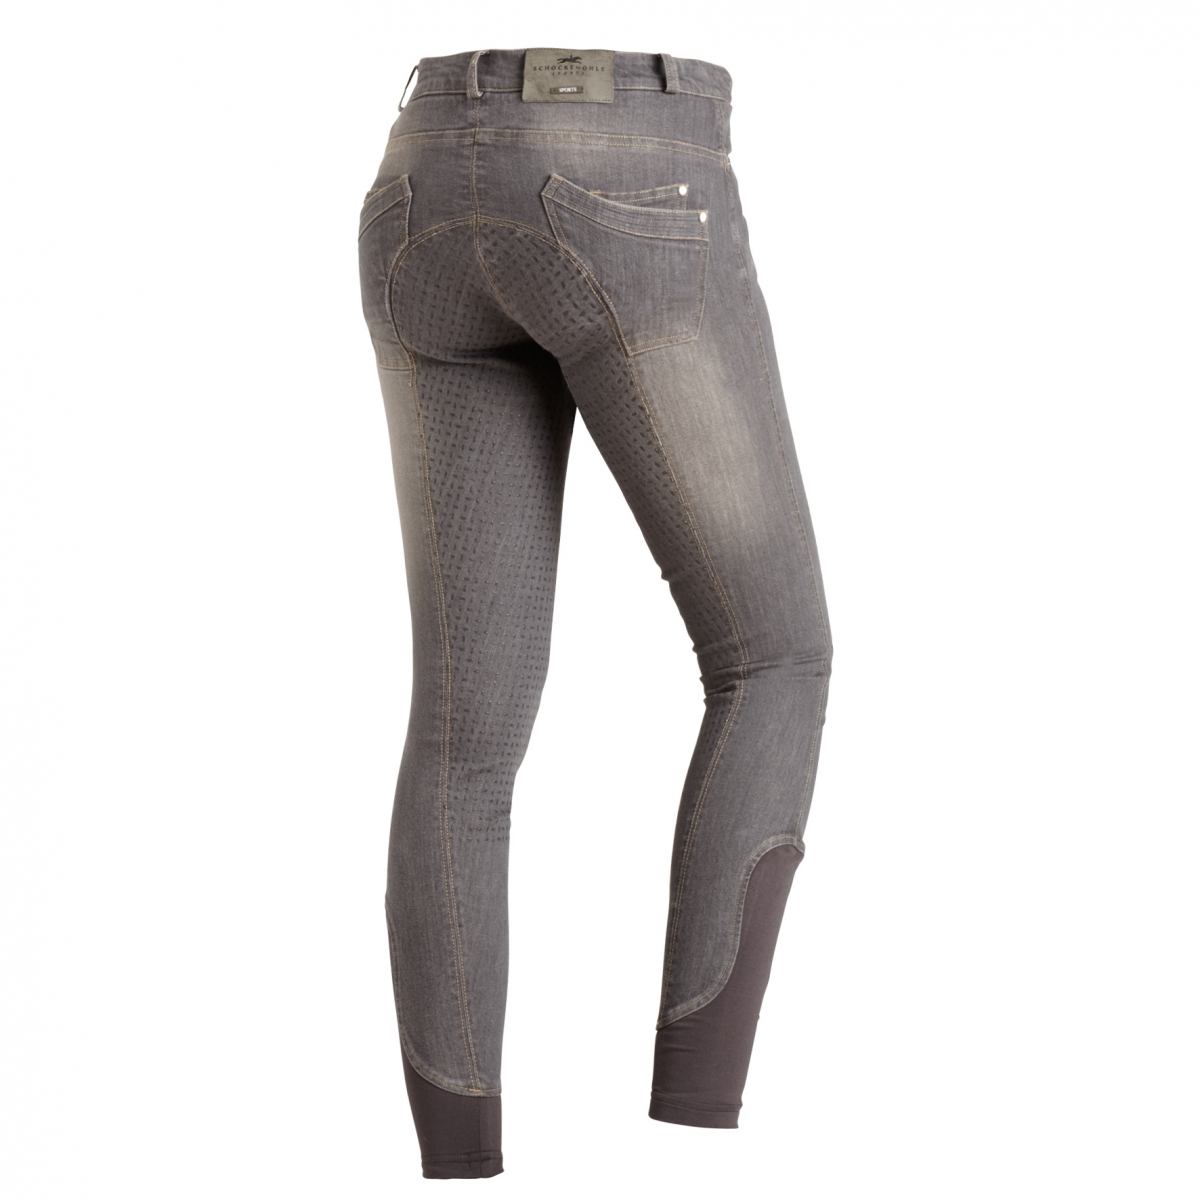 Bryczesy DELPHI damskie - Schockemohle - graphite